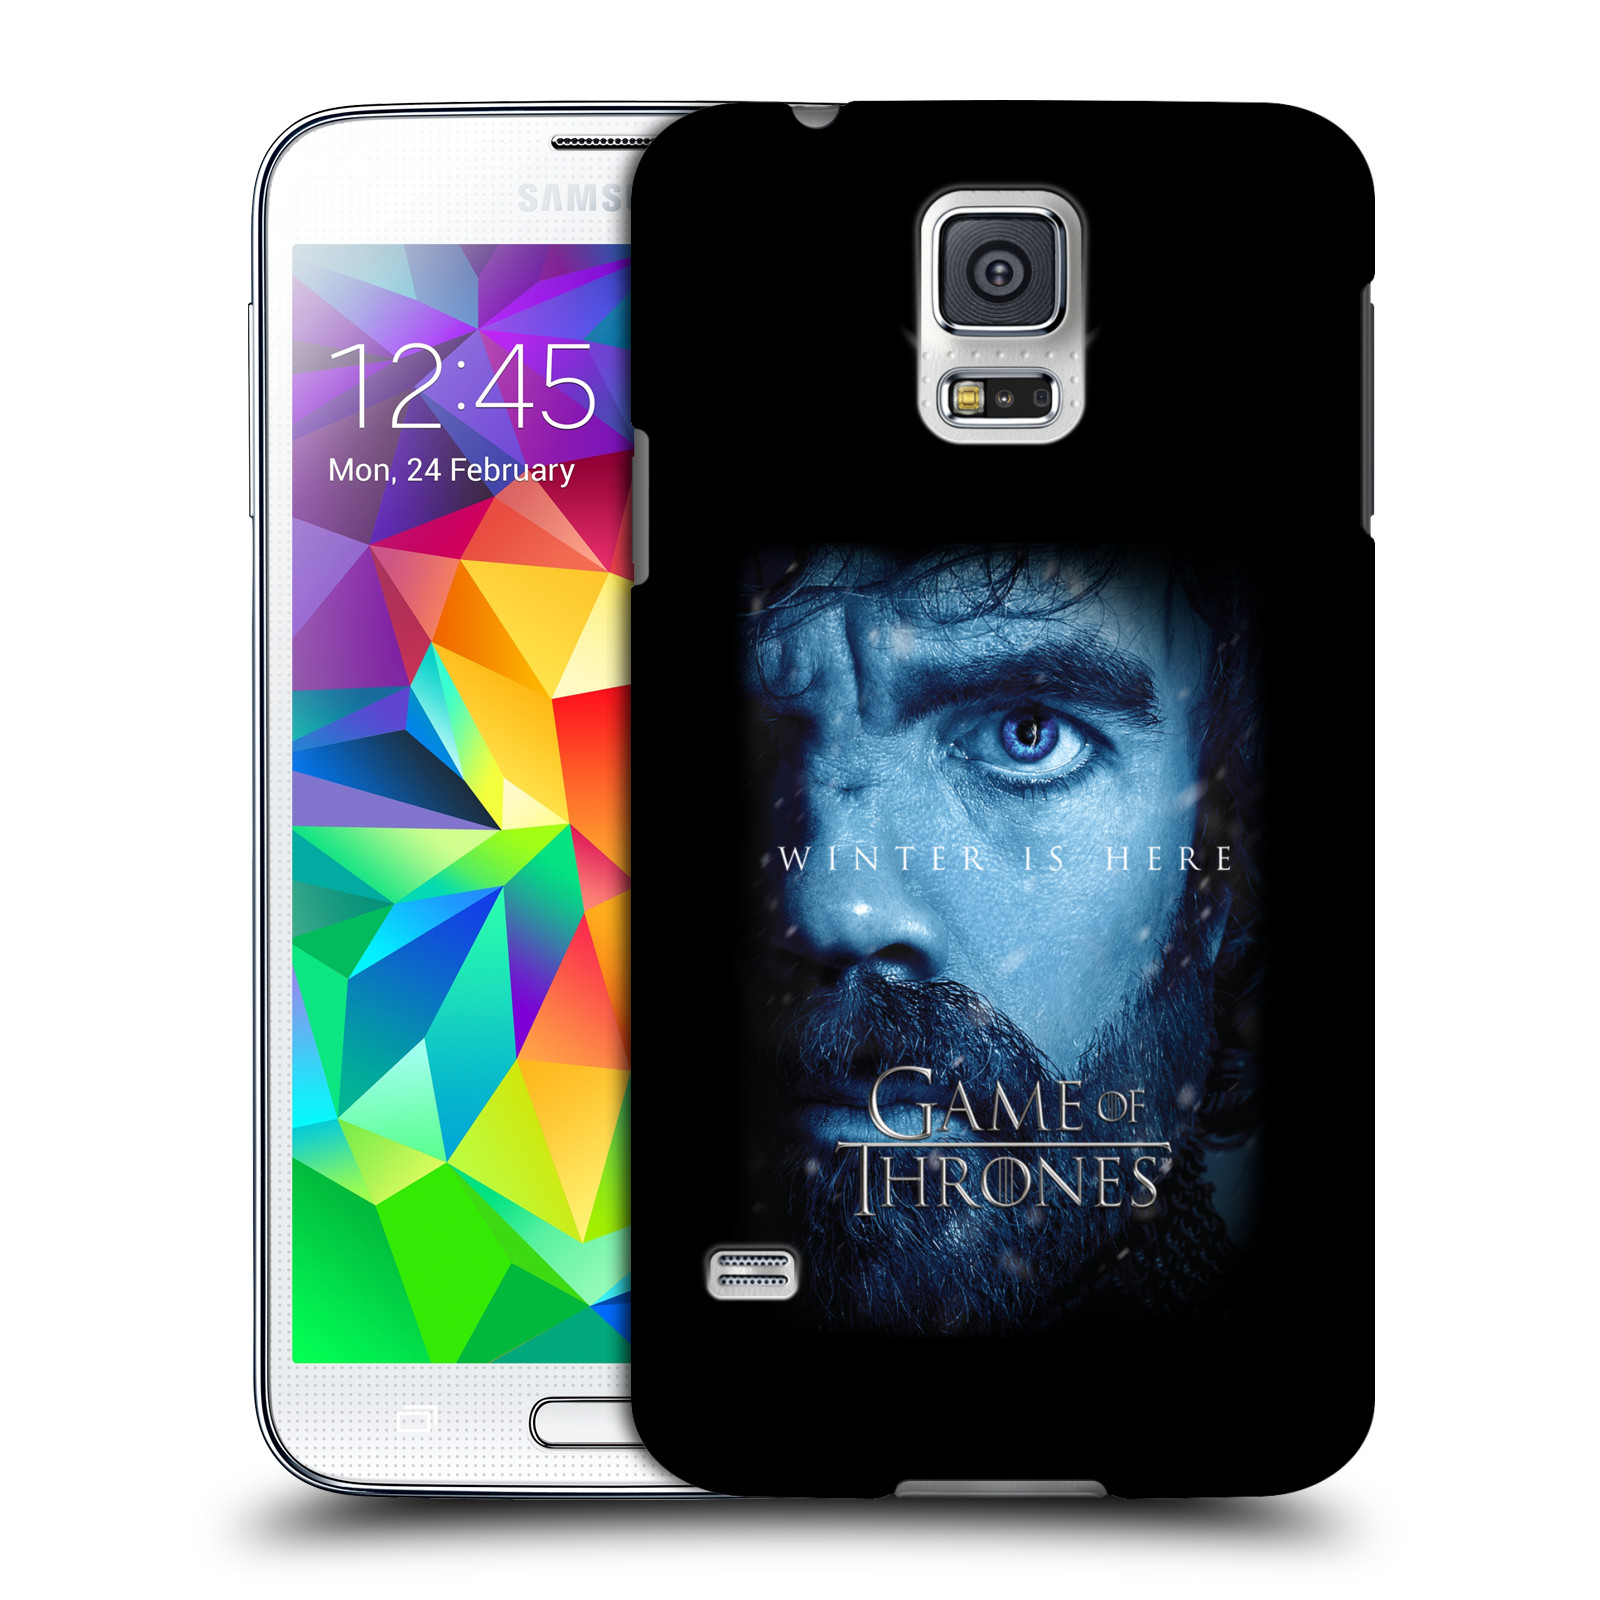 Plastové pouzdro na mobil Samsung Galaxy S5 Neo - Head Case - Hra o trůny - Tyrion Lannister - Winter is here